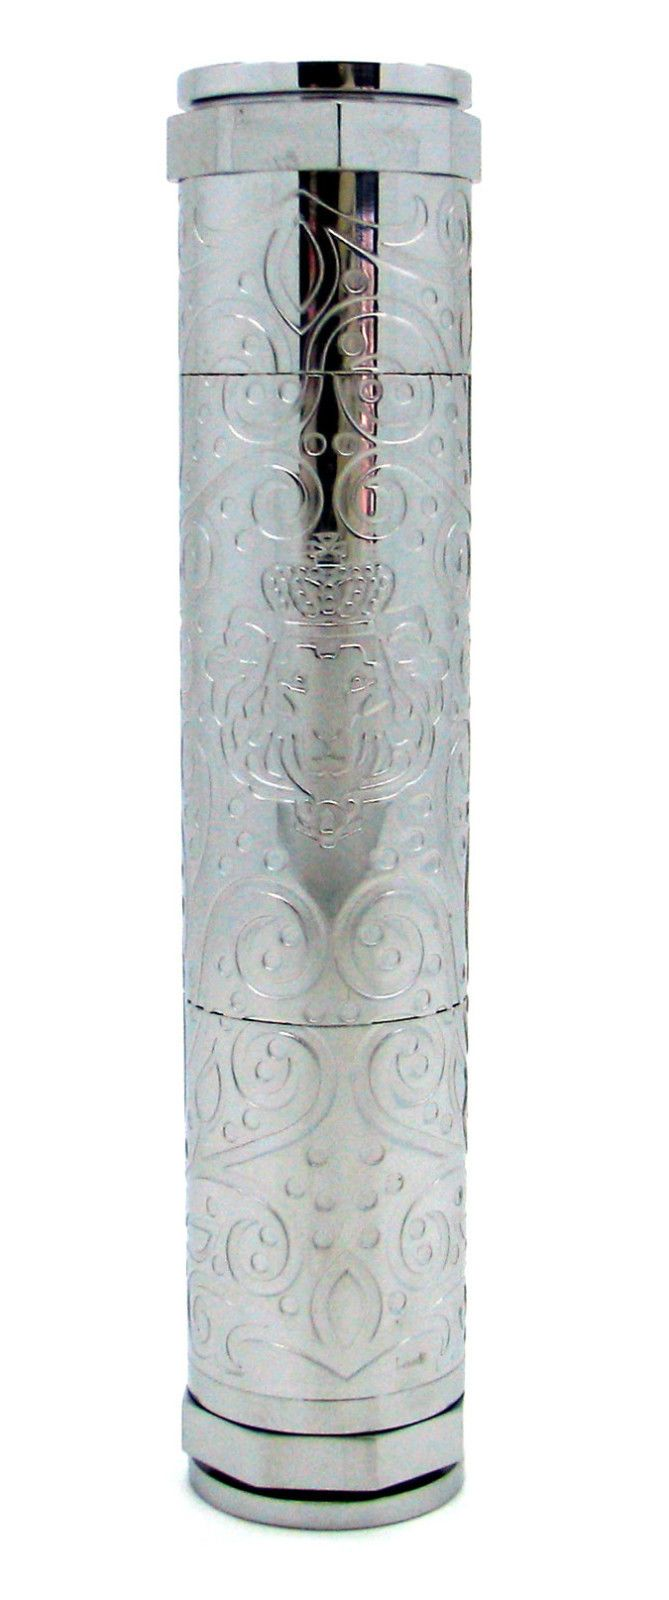 King Mechanical Mod Special Edition Engraved King Mod US Seller | eBay